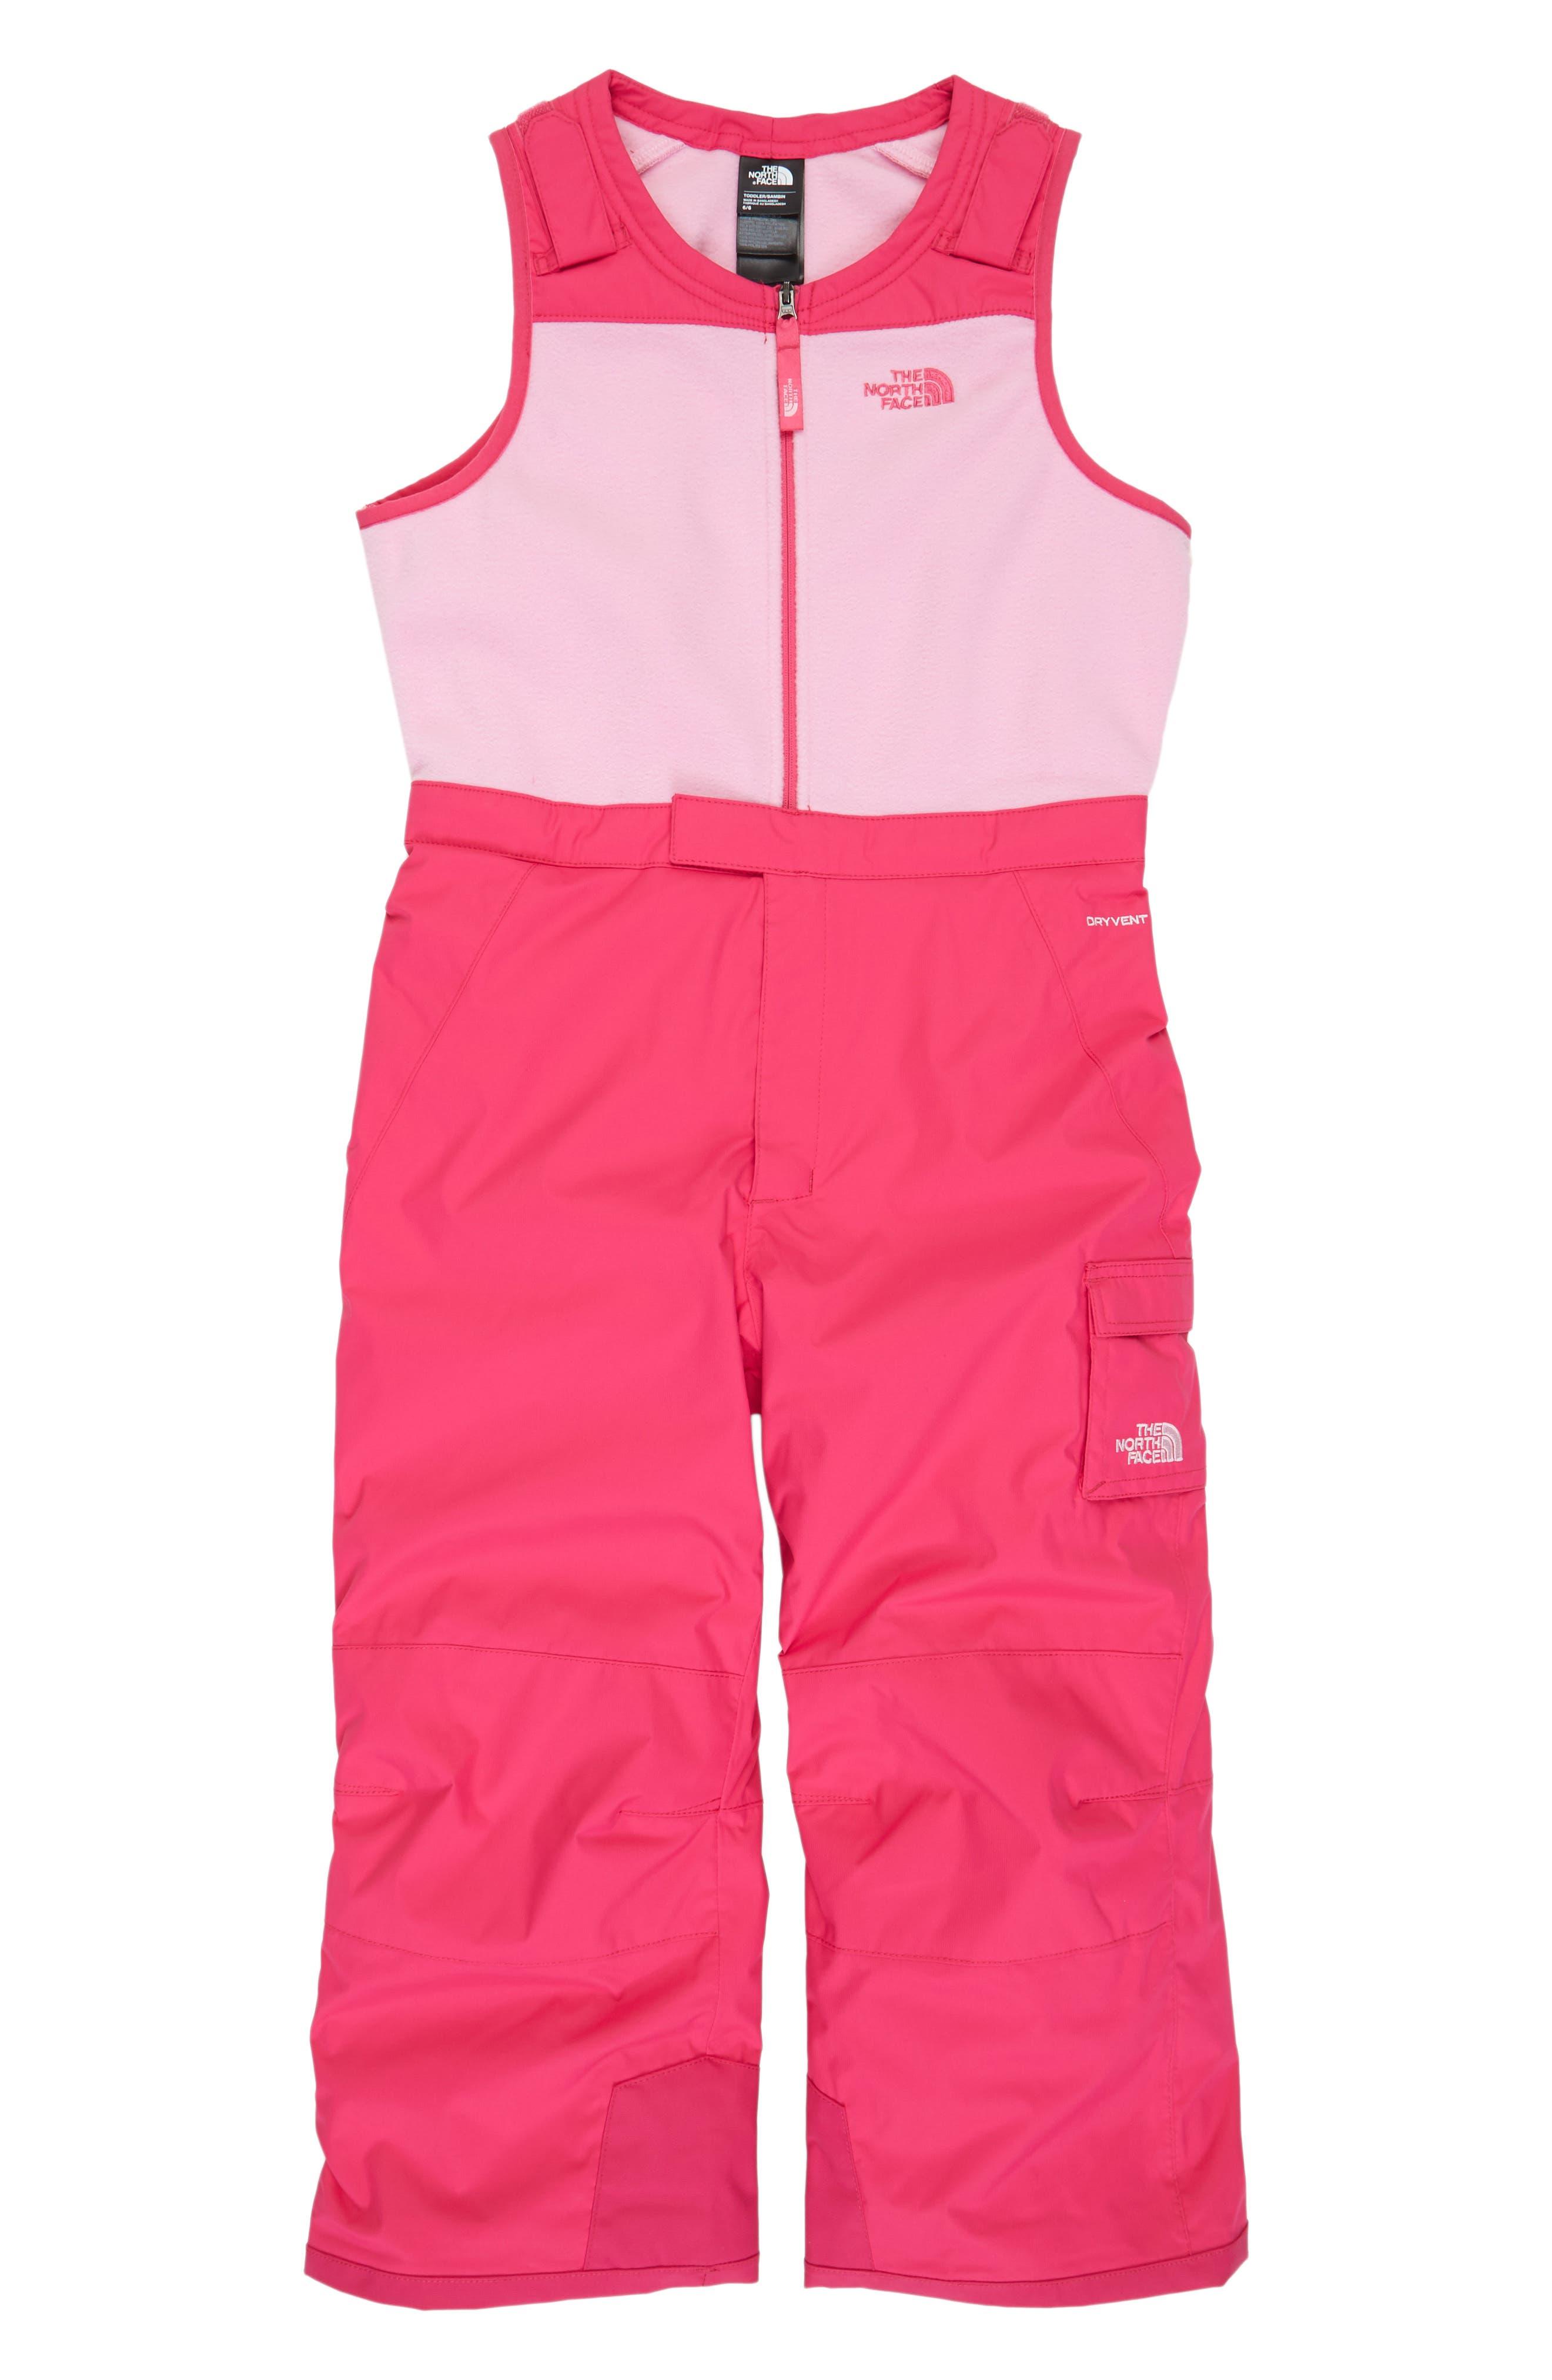 Main Image - The North Face Heatseeker™ Insulated Waterproof Bib Snowsuit (Toddler Girls & Little Girls)